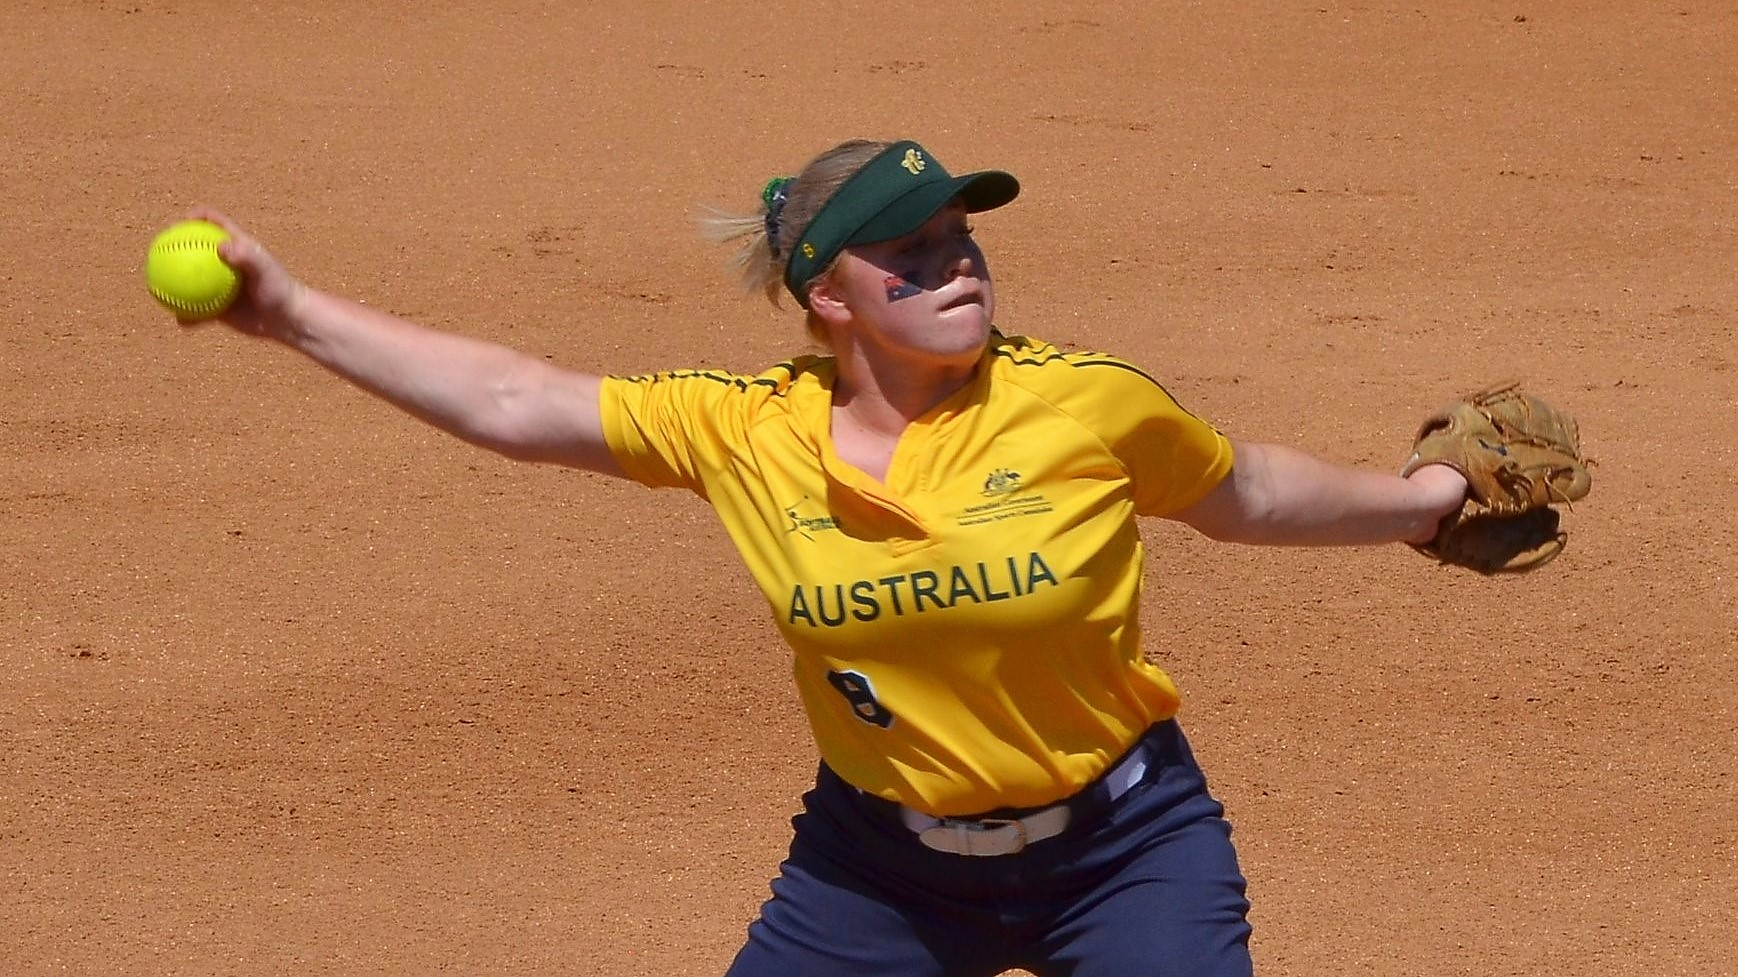 Georgia Hood started for Australia